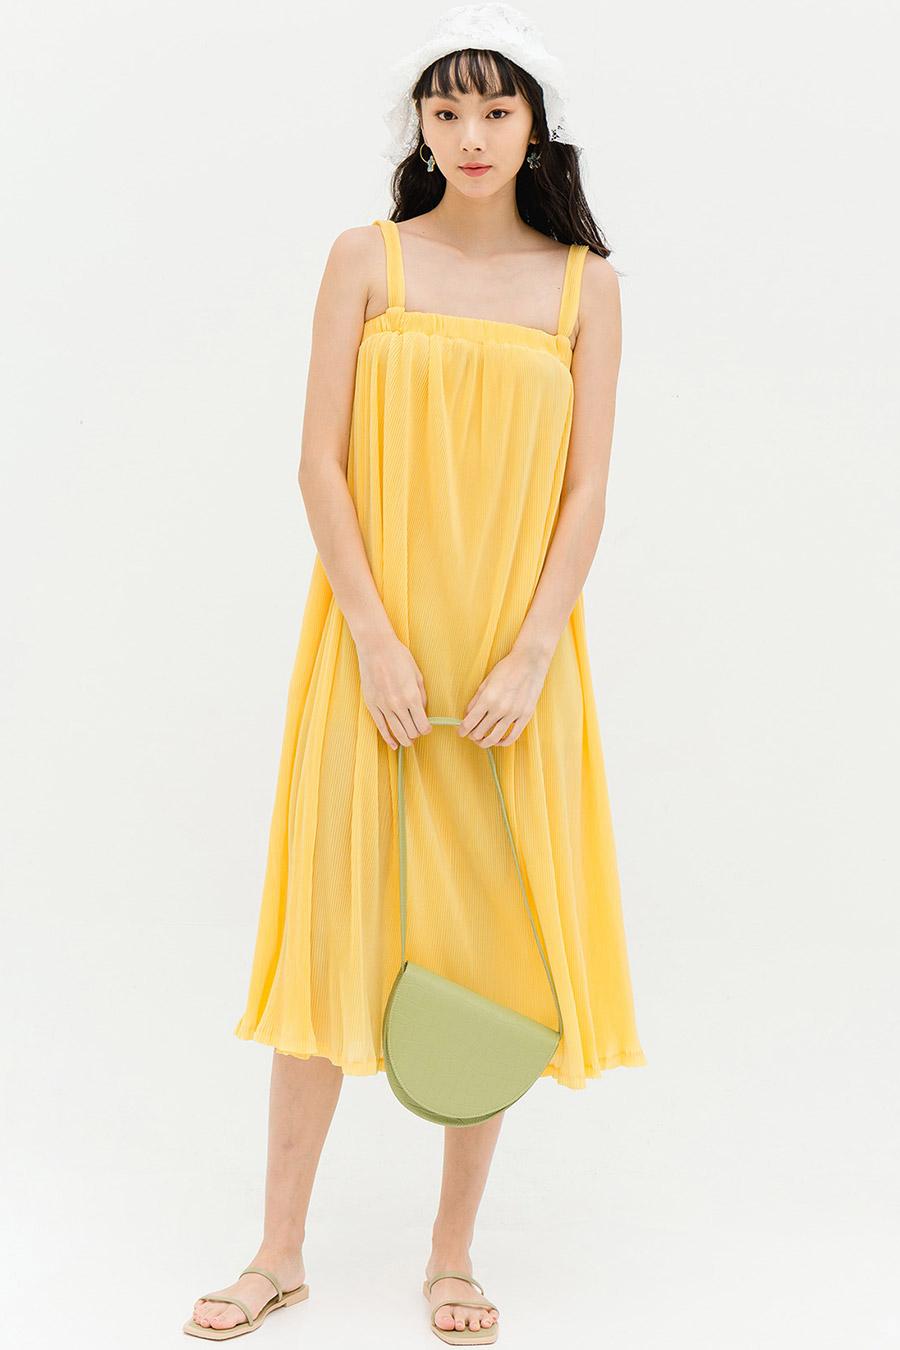 ANTONIA DRESS - SUN GOLD [BY MODPARADE]